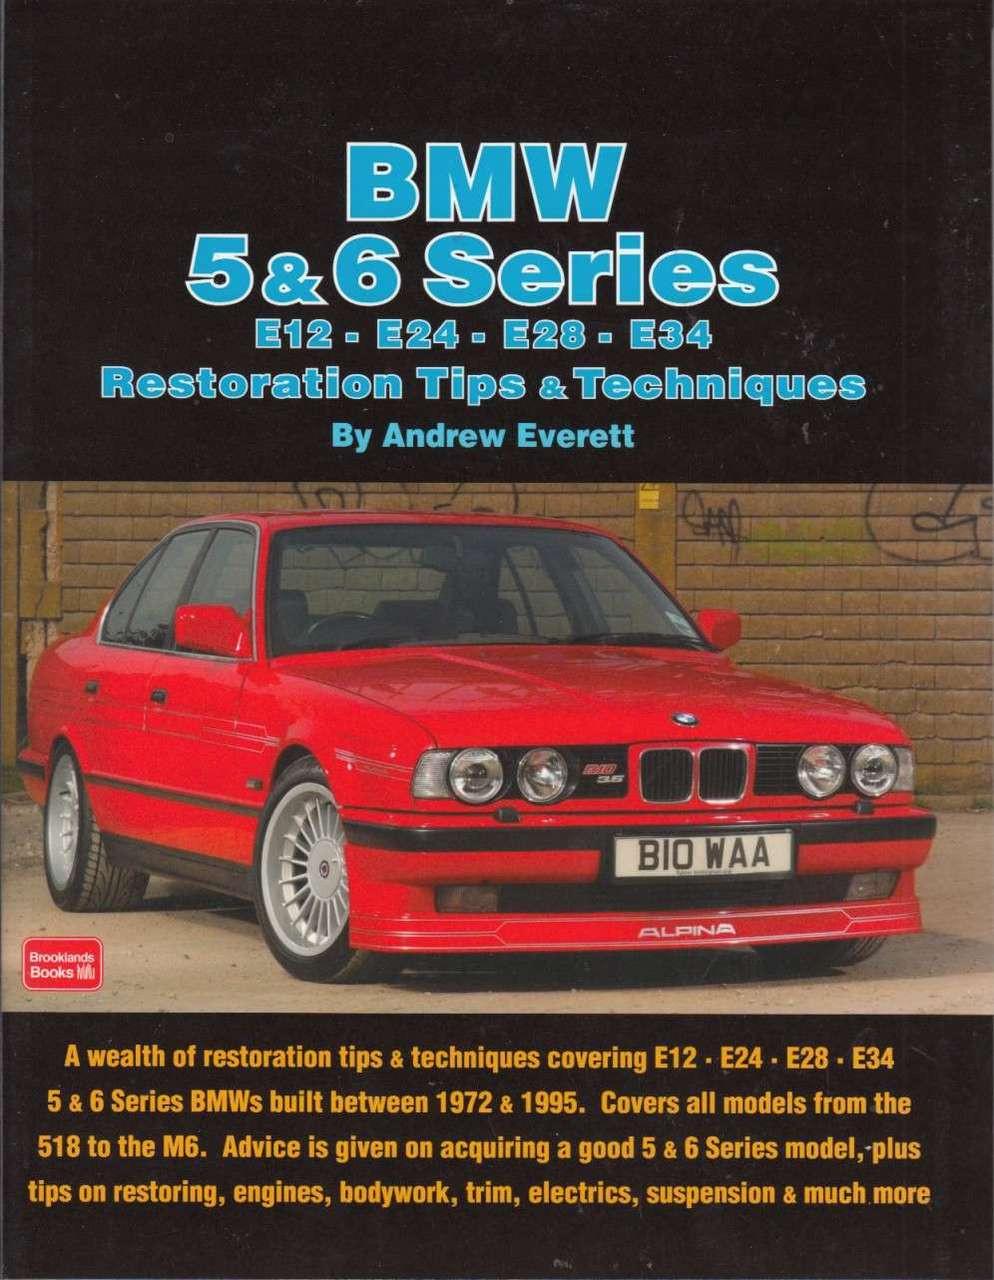 BMW 5 & 6 Series Restoration Tips & Techniques ...